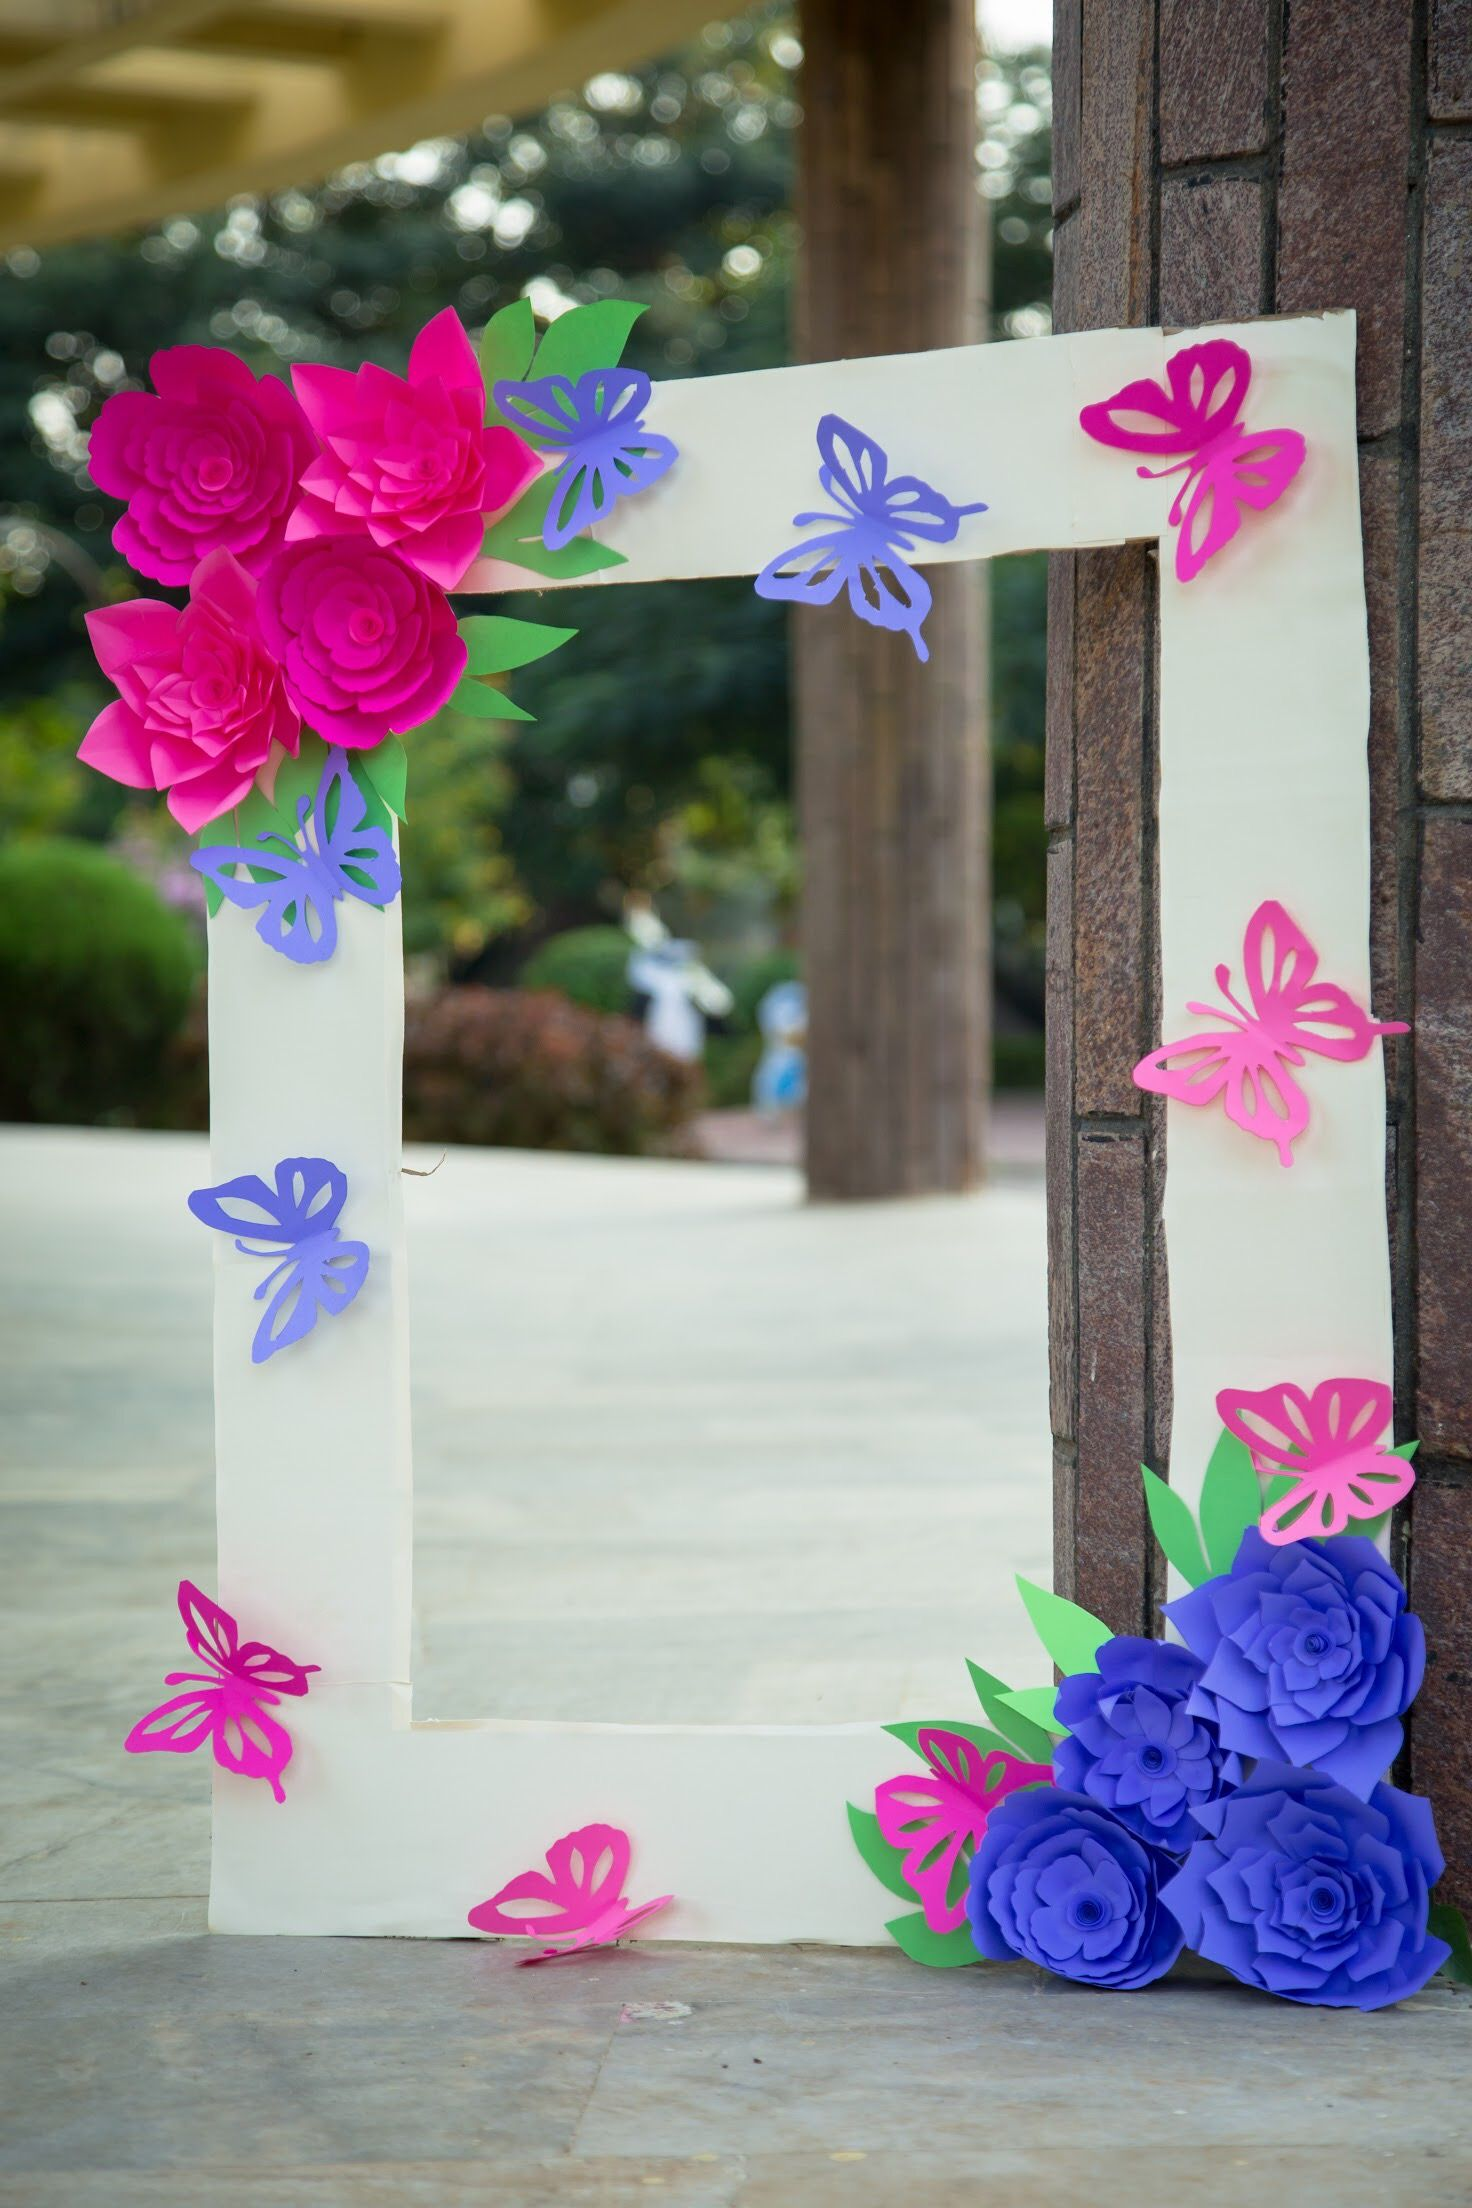 Pin by anusha vallabhaneni on strengthsss Pinterest Backdrops